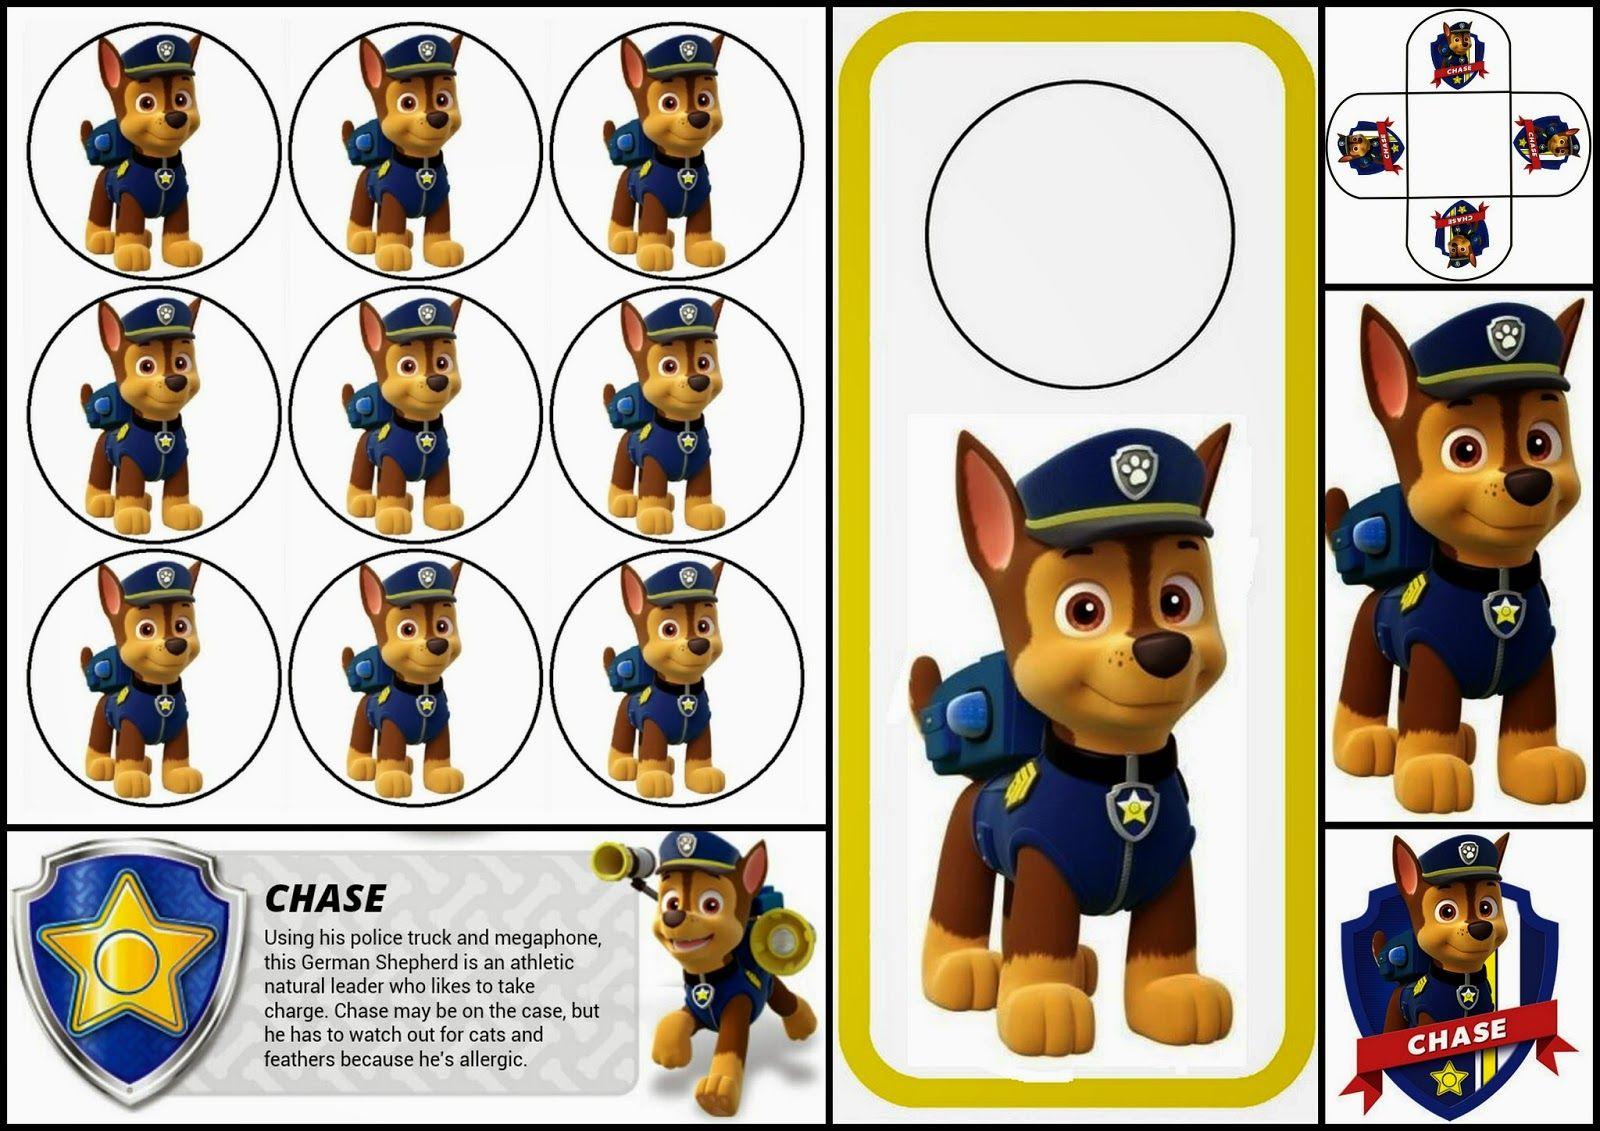 Dibujos Para Colorear Patrulla Canina Chase: Paw Patrol O Patrulla Canina: Divertido Mini Kit De Chase